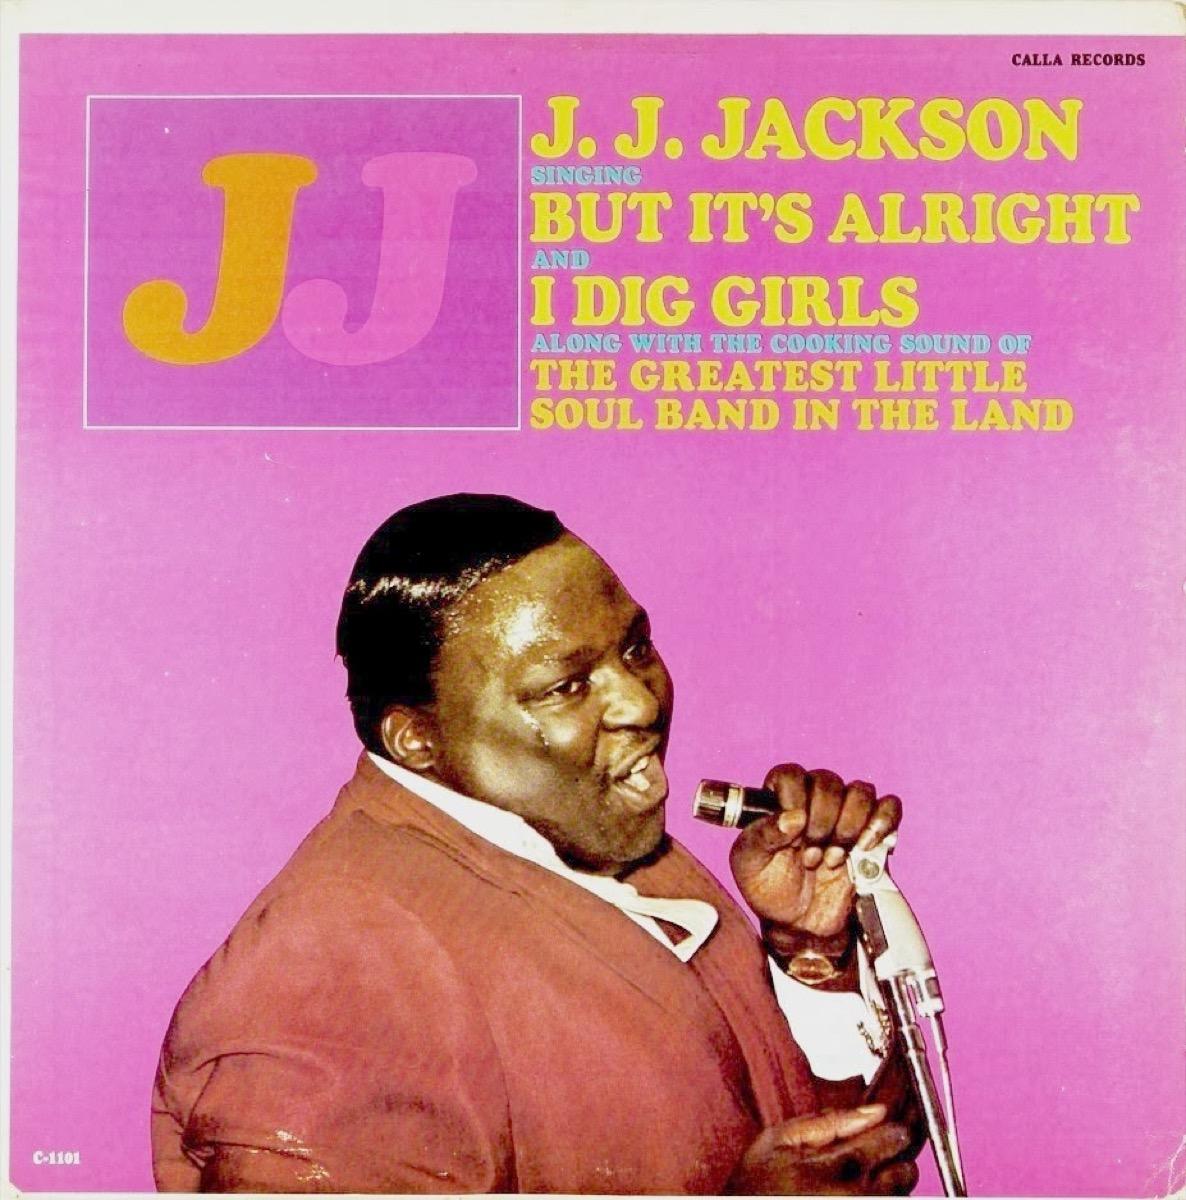 But It's Alright by J.J. Jackson